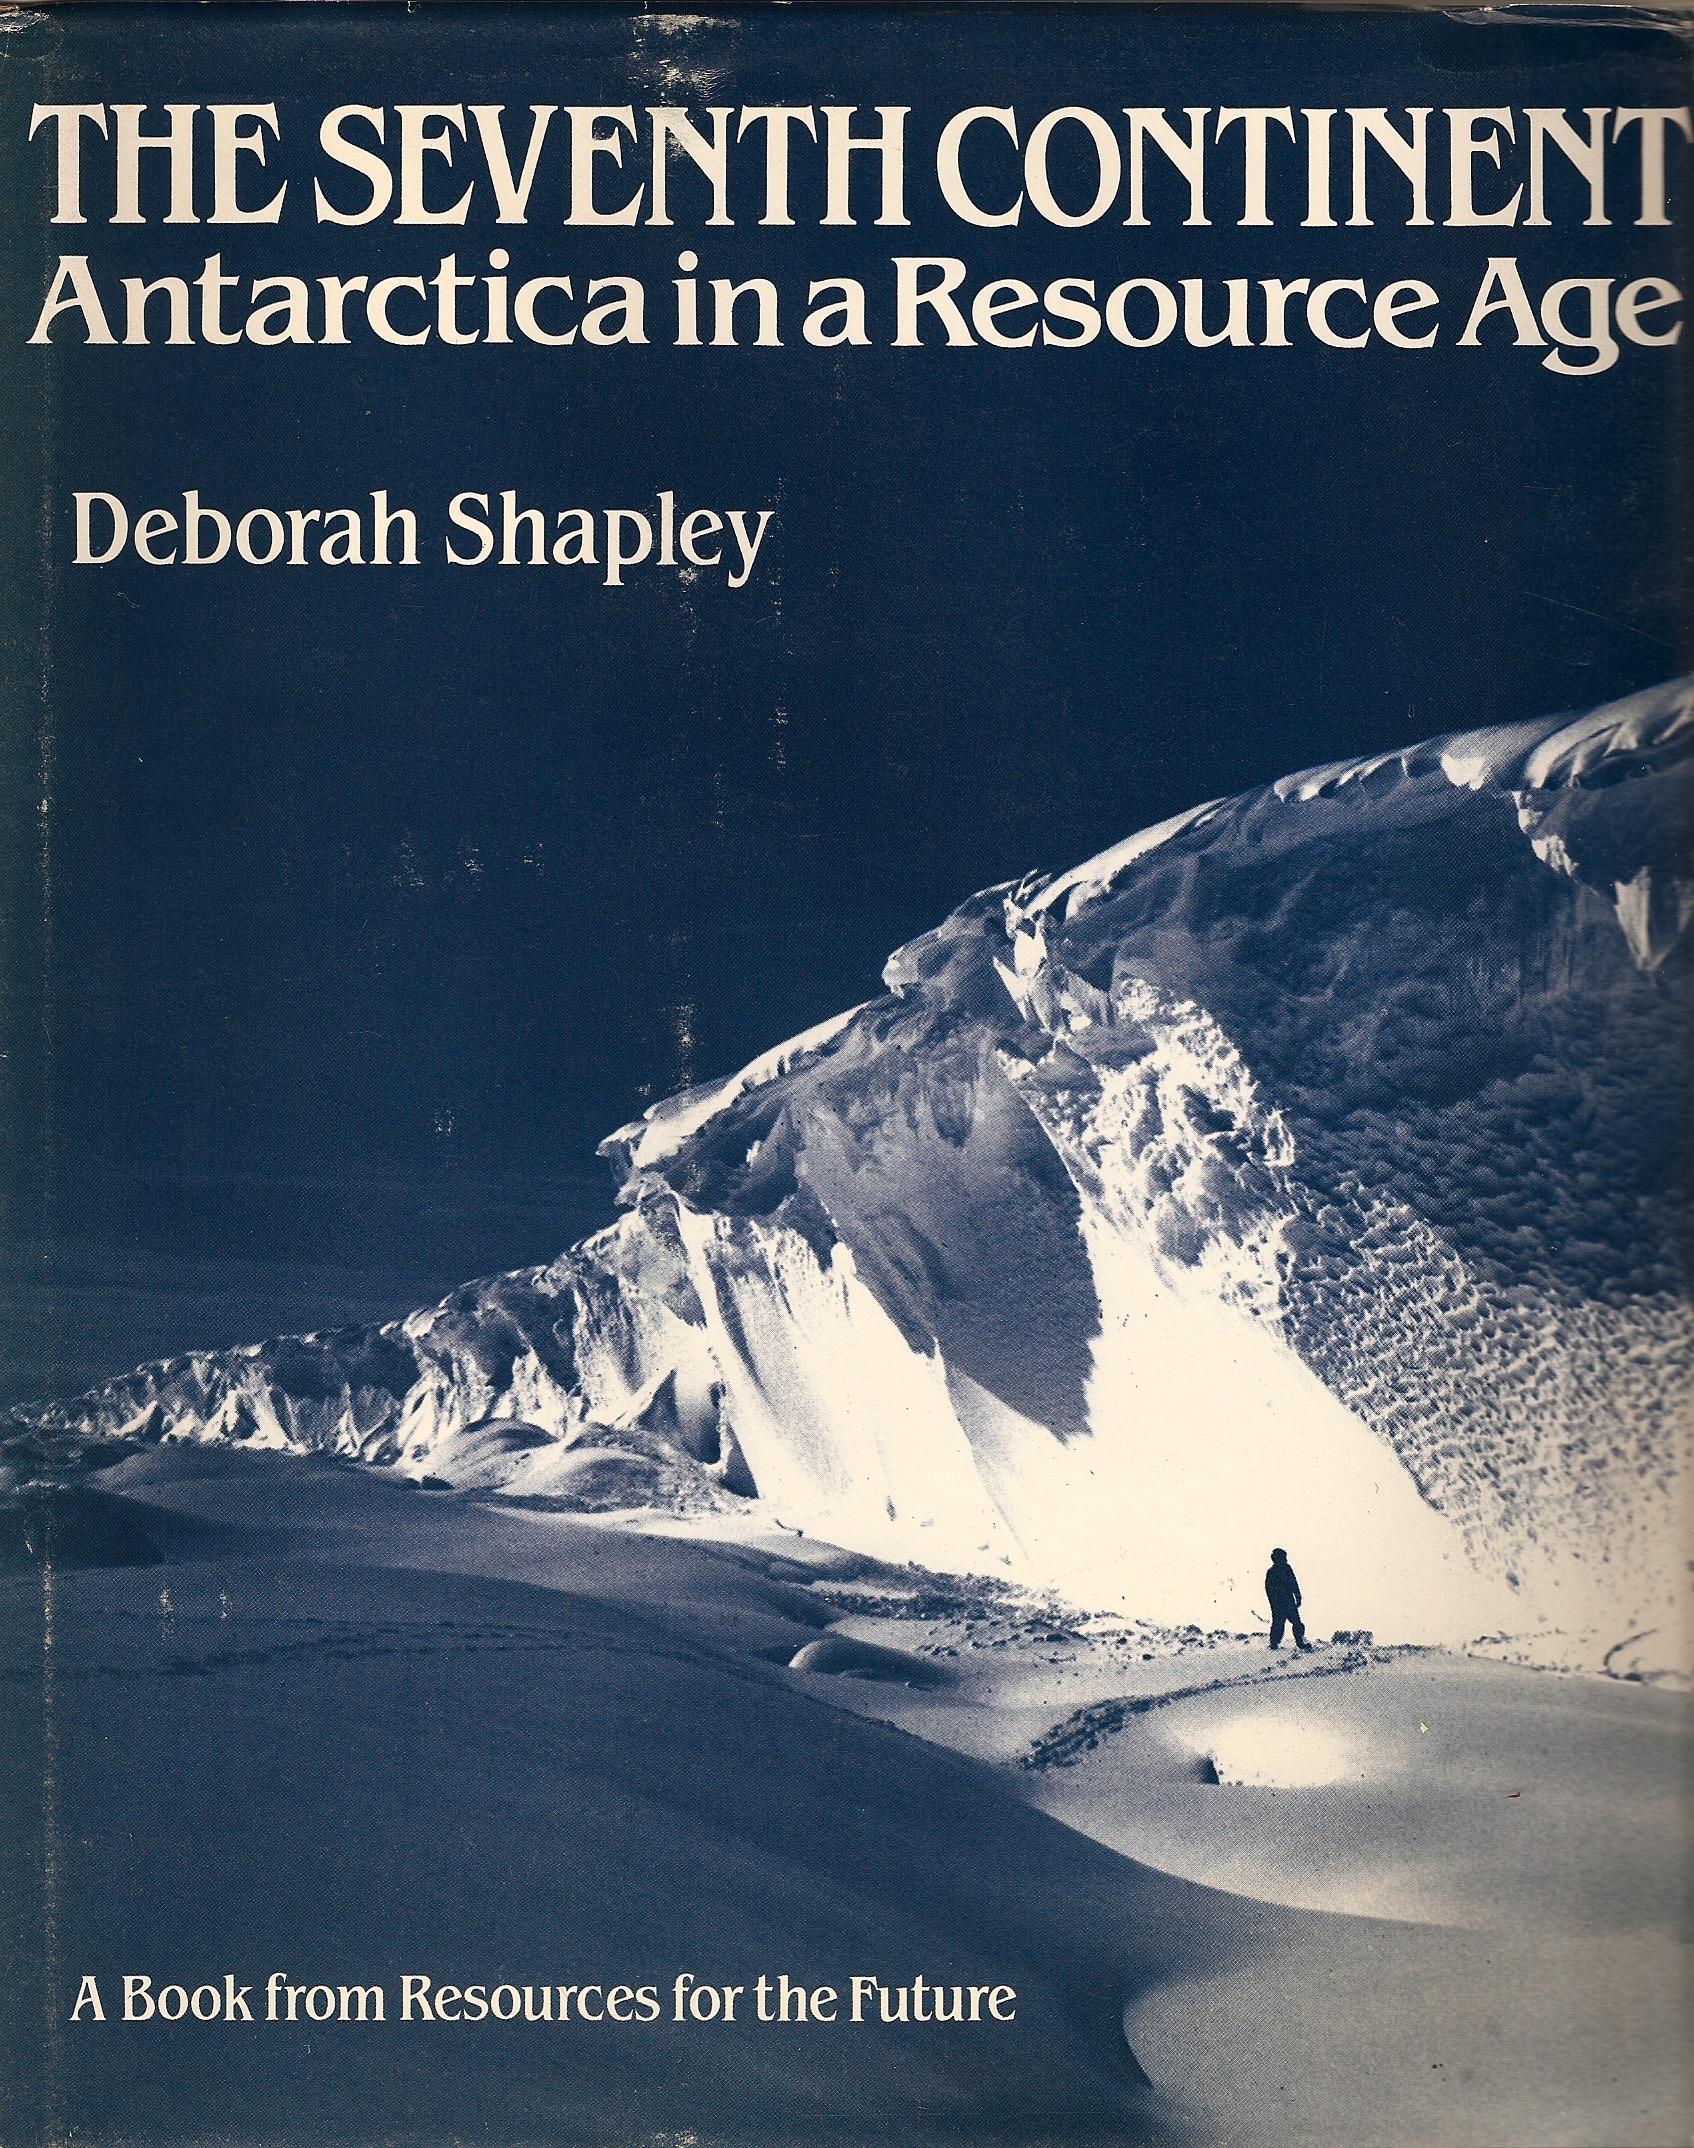 Resources for the Future/Johns Hopkins Univ. Press, 1985